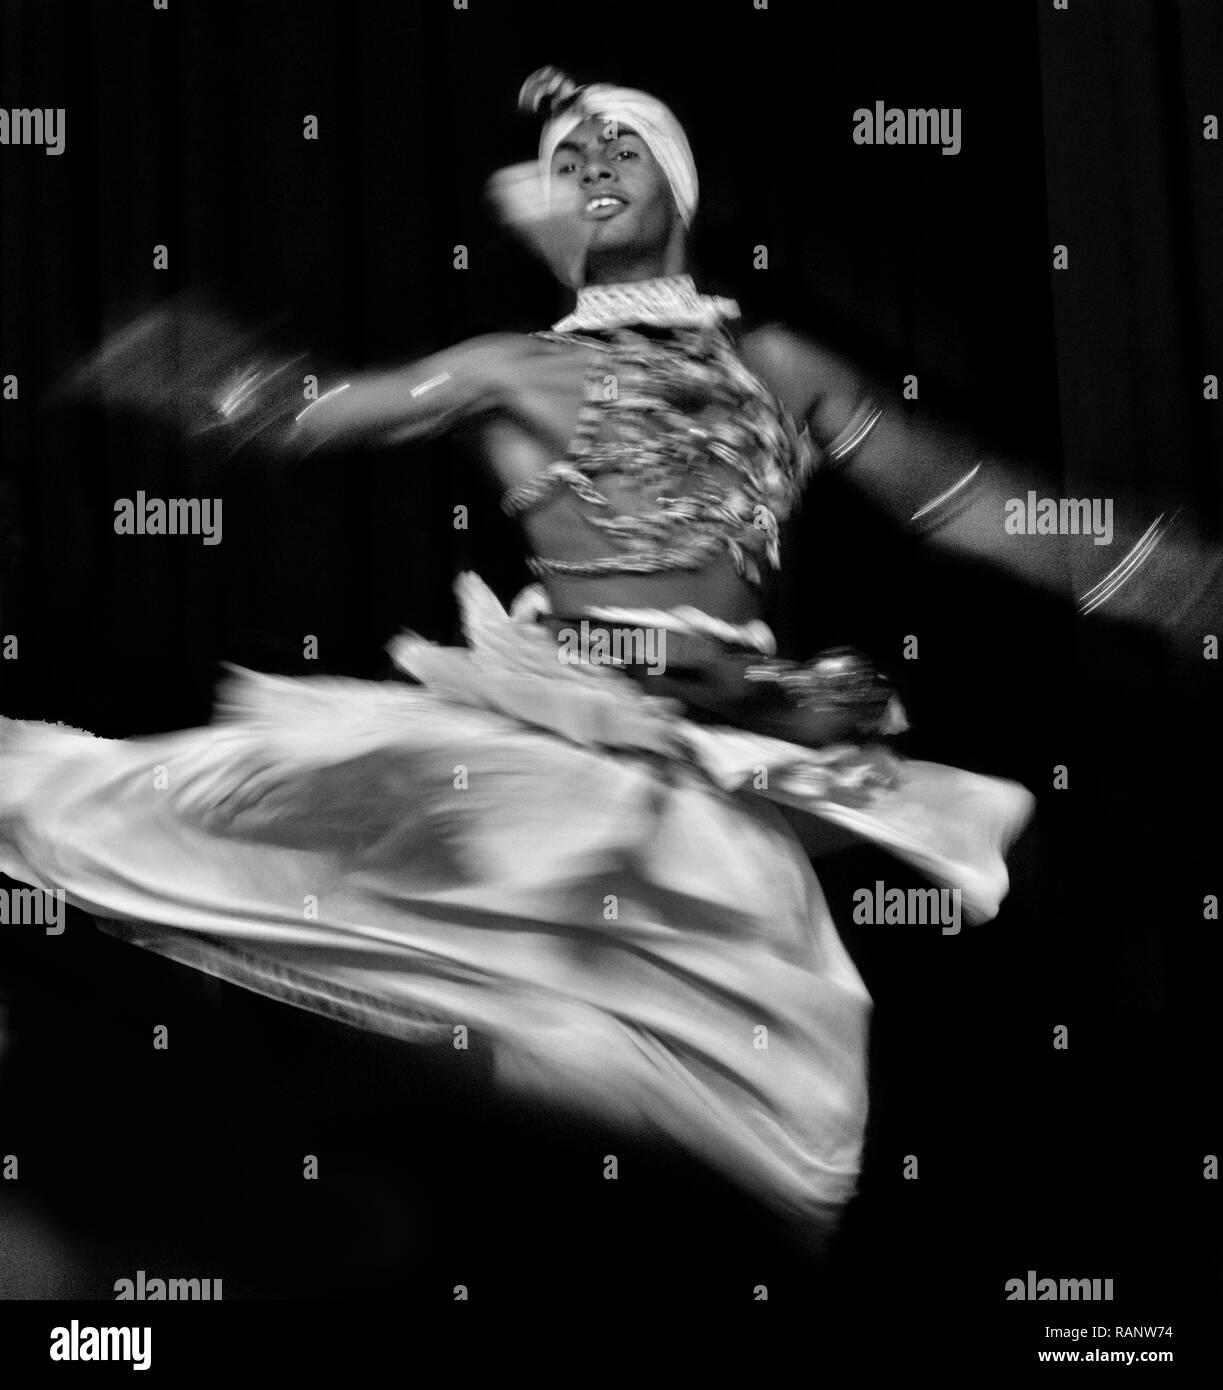 Whirling Kandy traditional dancer, Sri Lanka - Stock Image